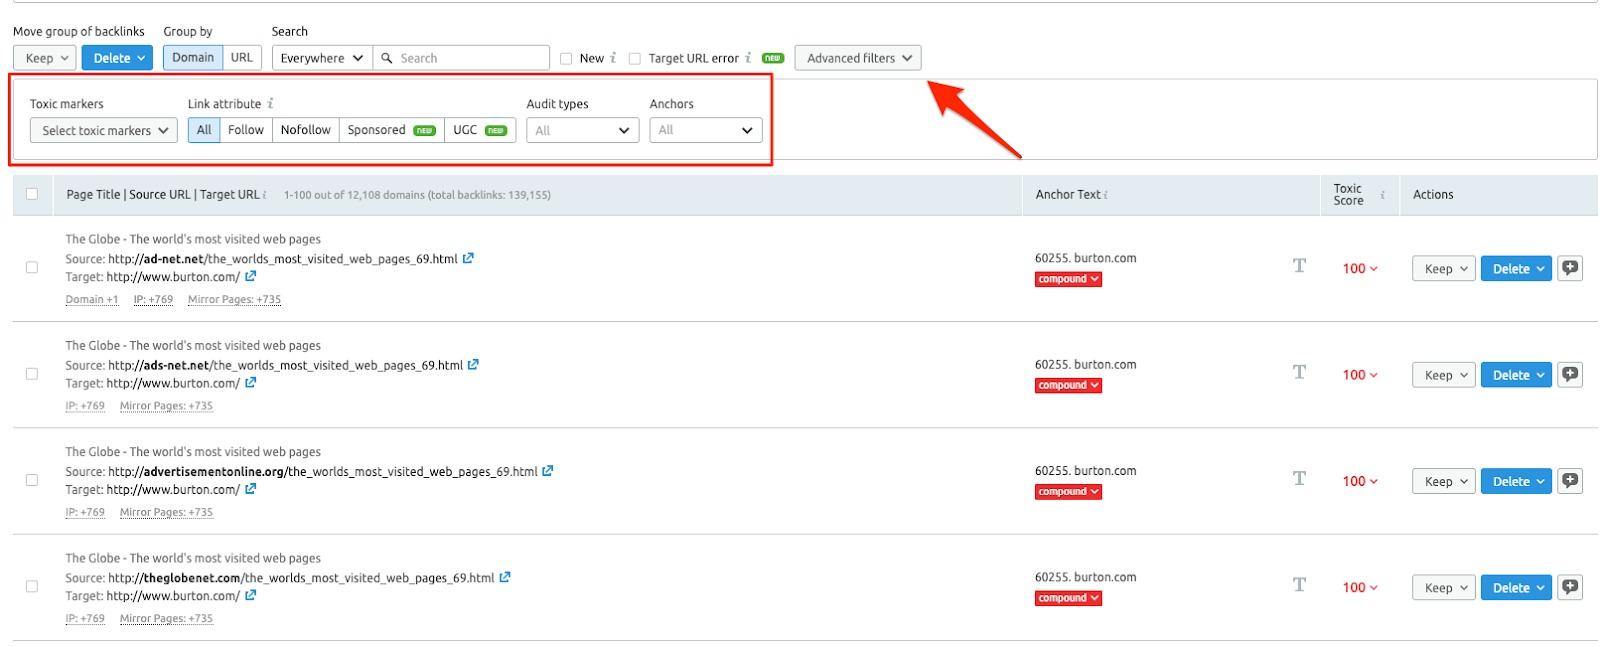 Cómo auditar tus backlinks image 6